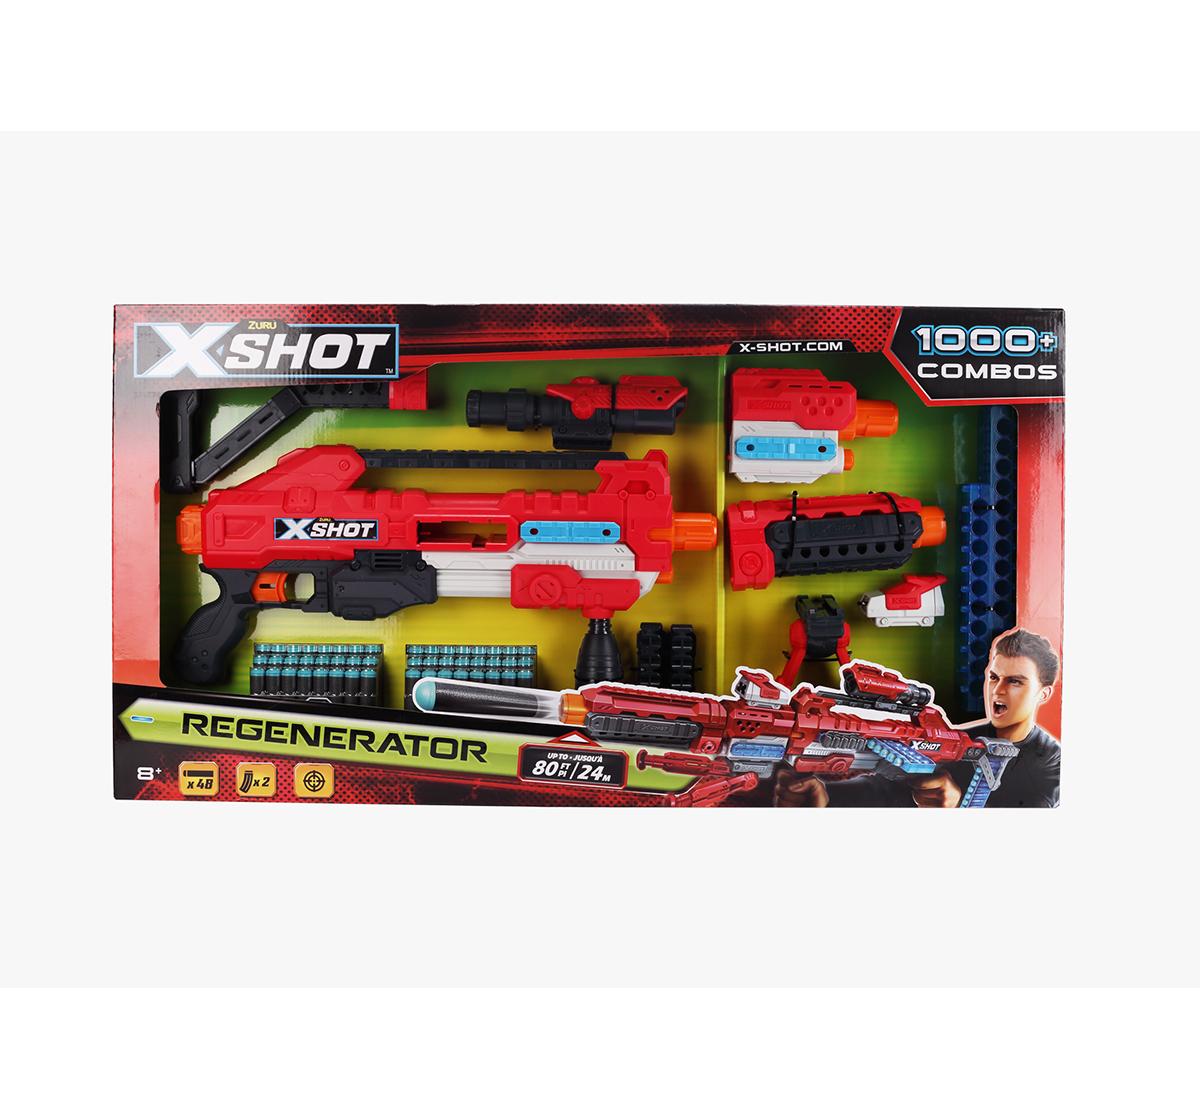 X-Shot | X-Shot Excel Regenerator Blasters for Kids age 8Y+